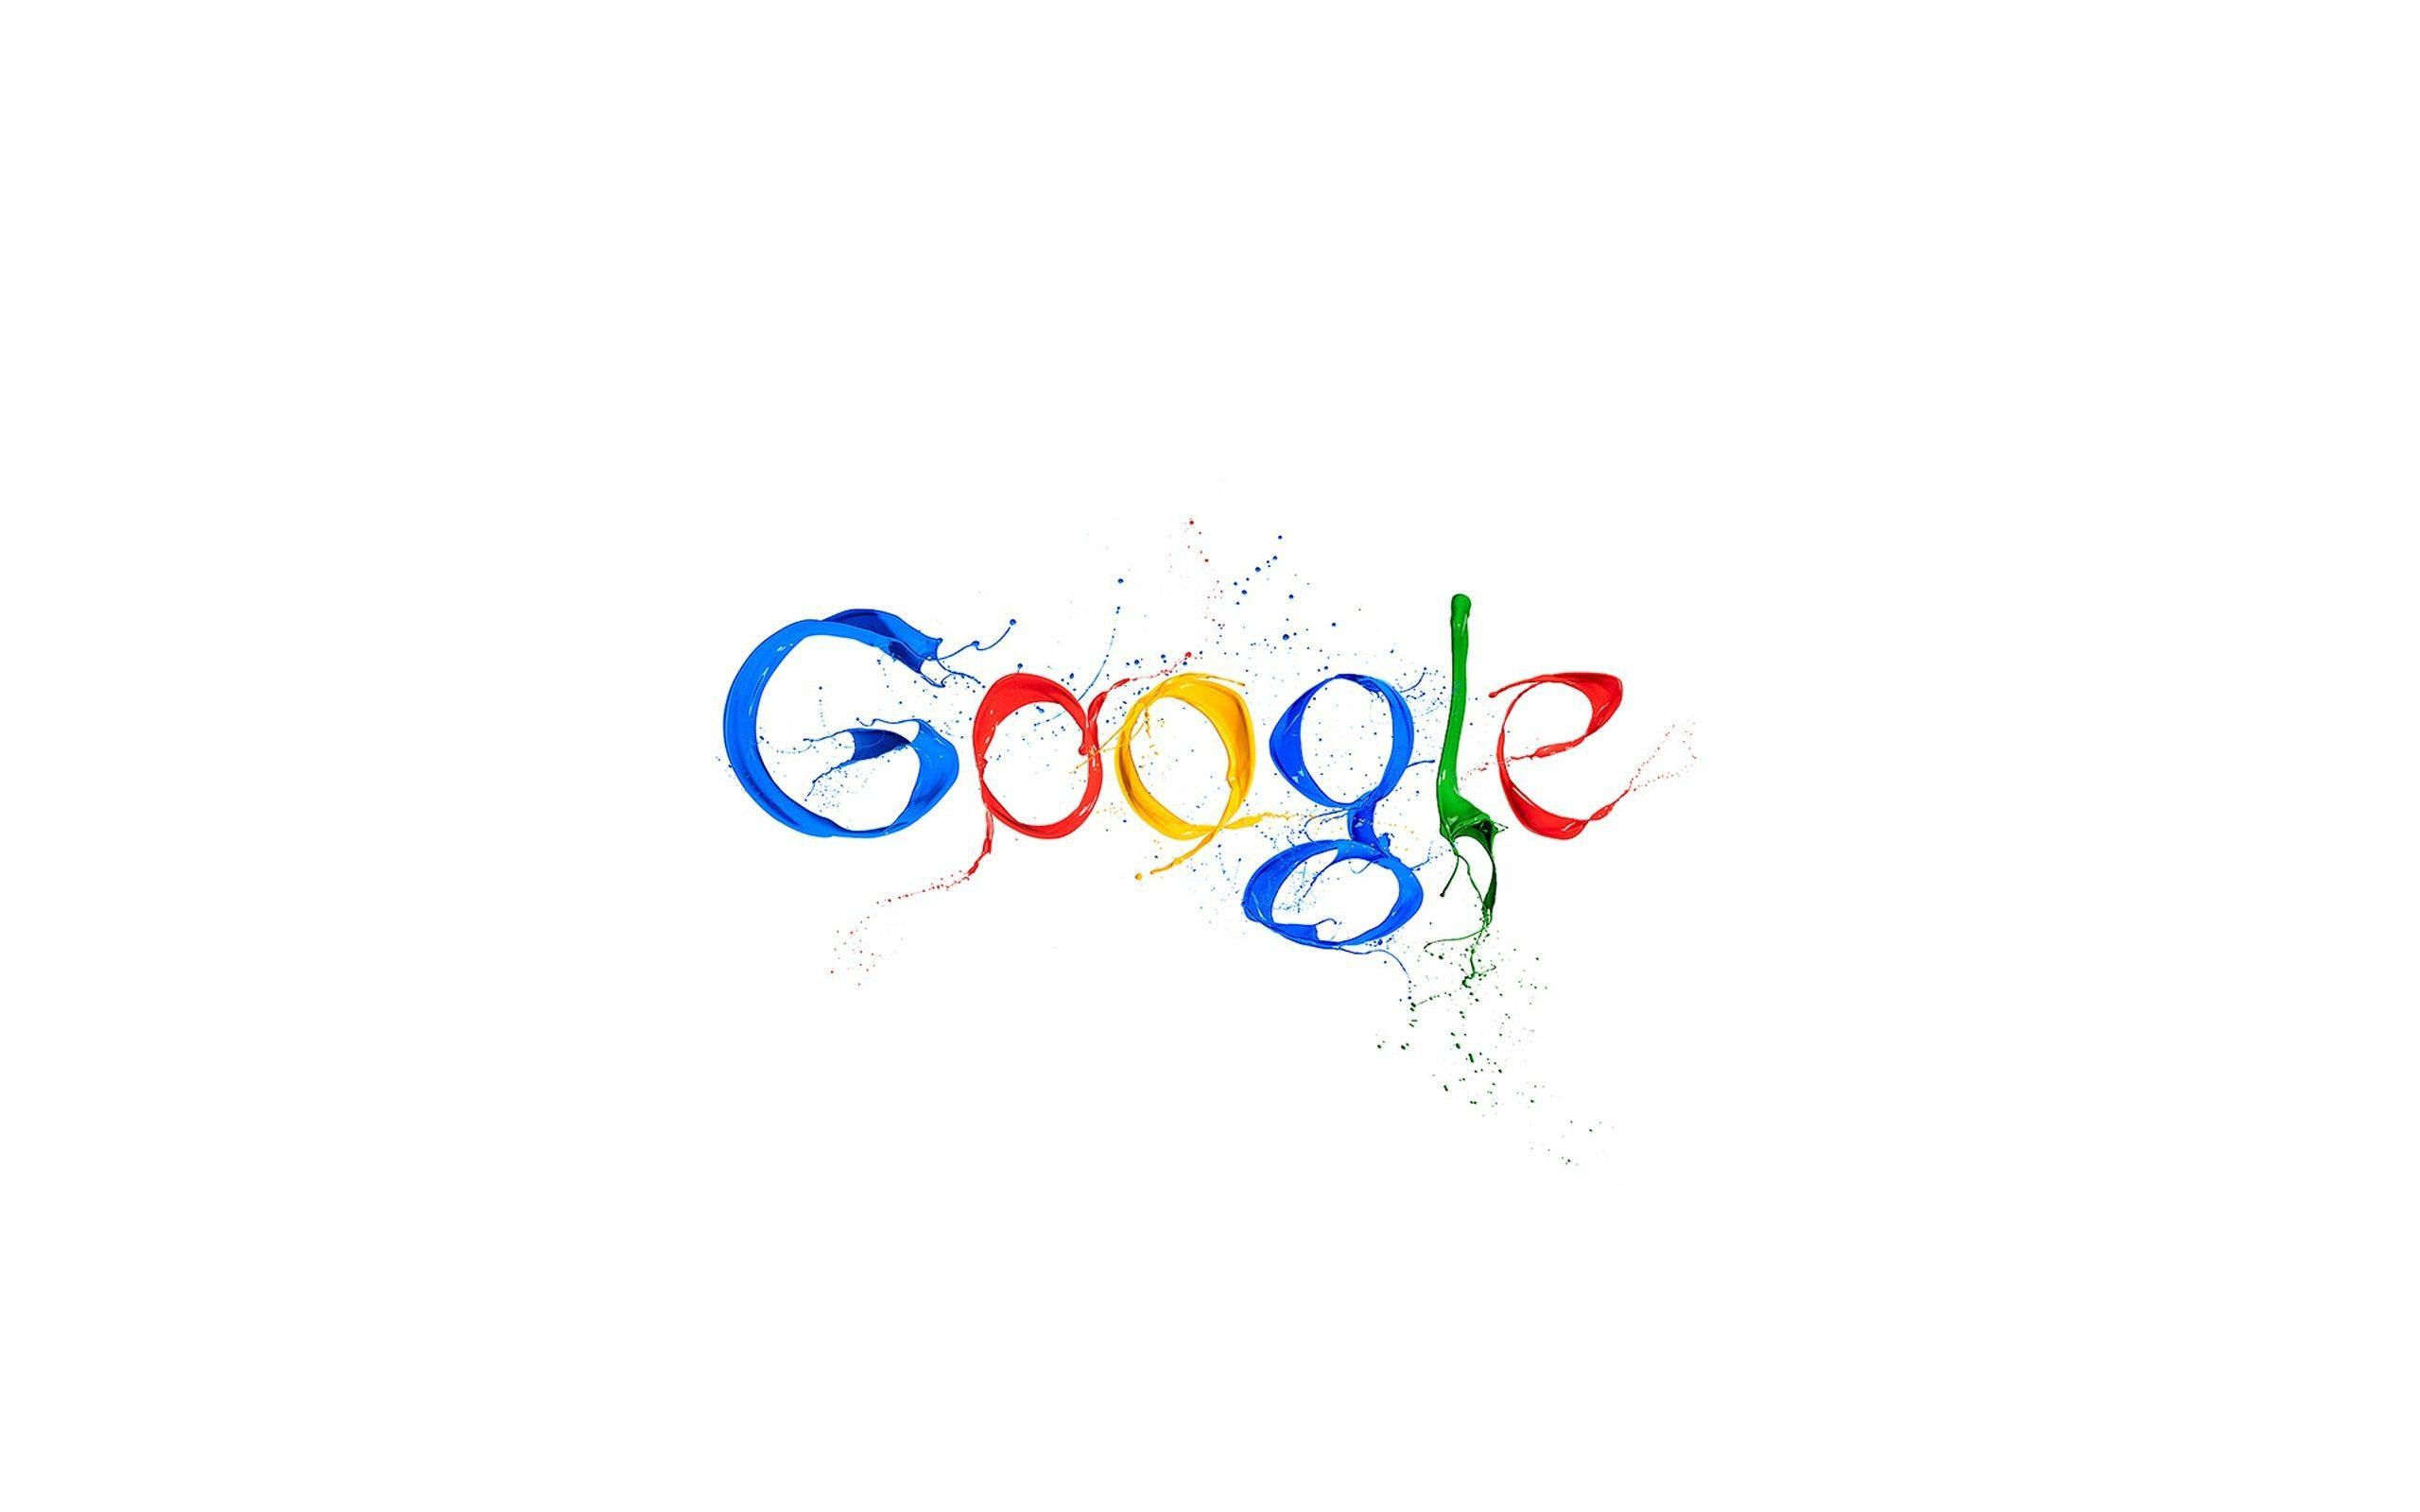 Paint Google Digital Art Logos White Background Wallpaper White Background Wallpaper Art Logo Google Logo